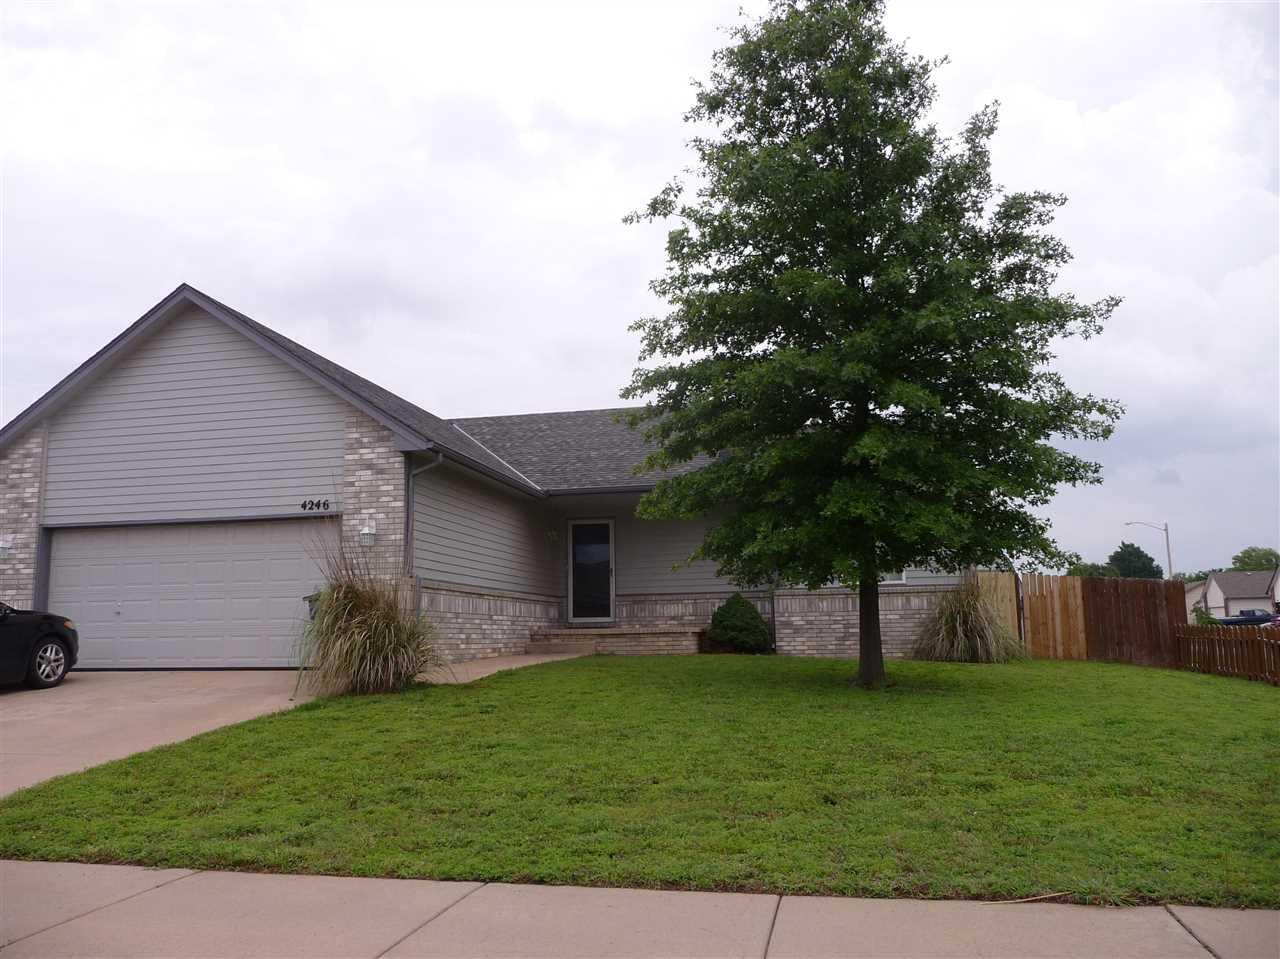 4246 S Boyd St, Wichita, KS 67215